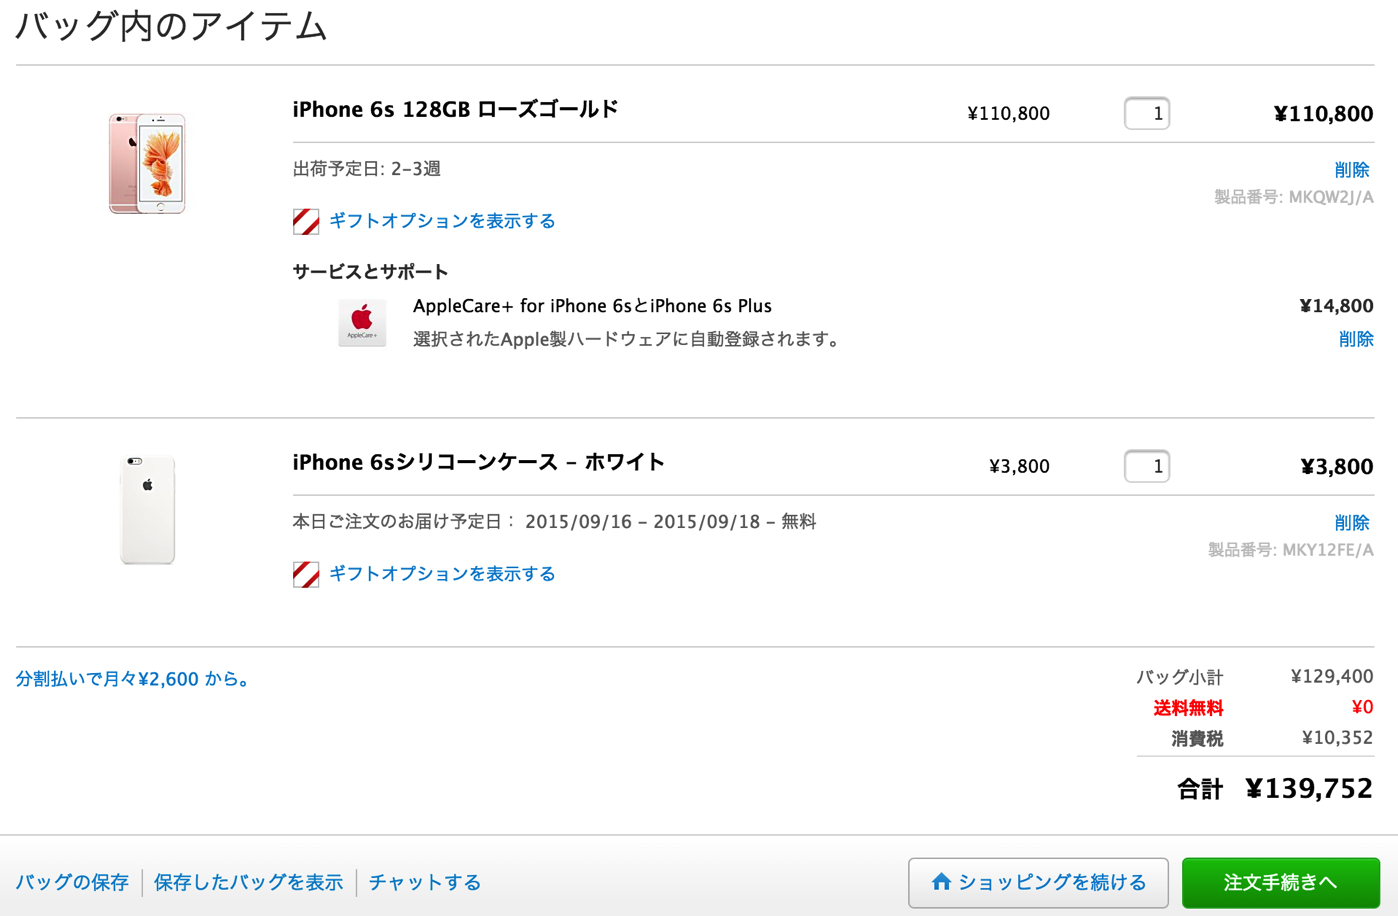 iPhone 6s 128GB ローズゴールド